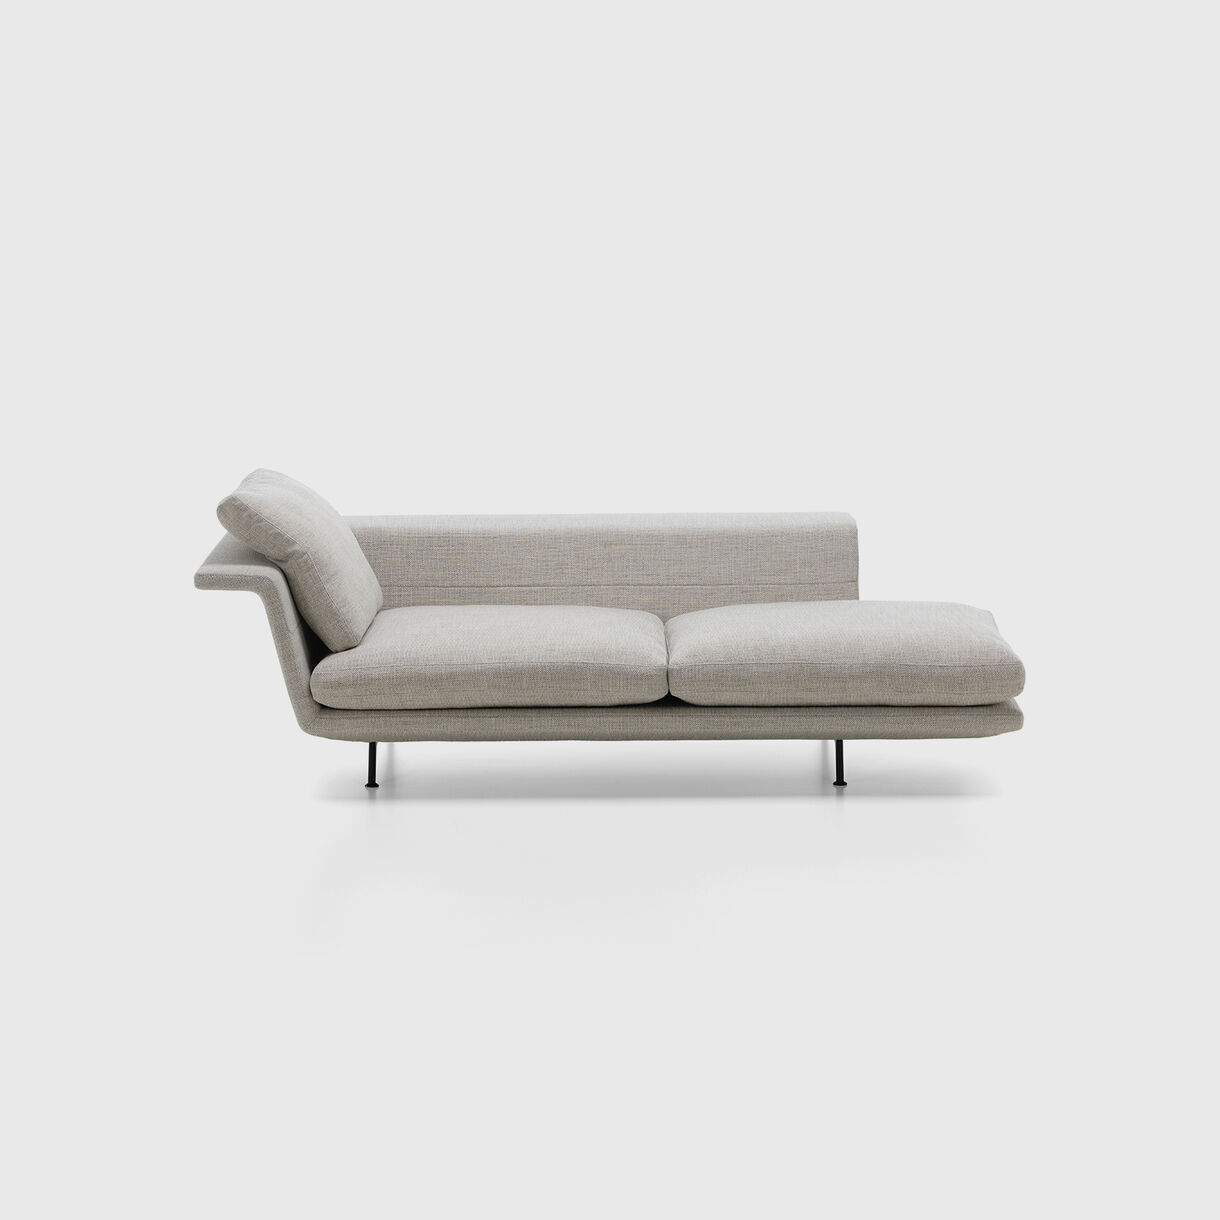 Grand Sofa Chaise Lounge